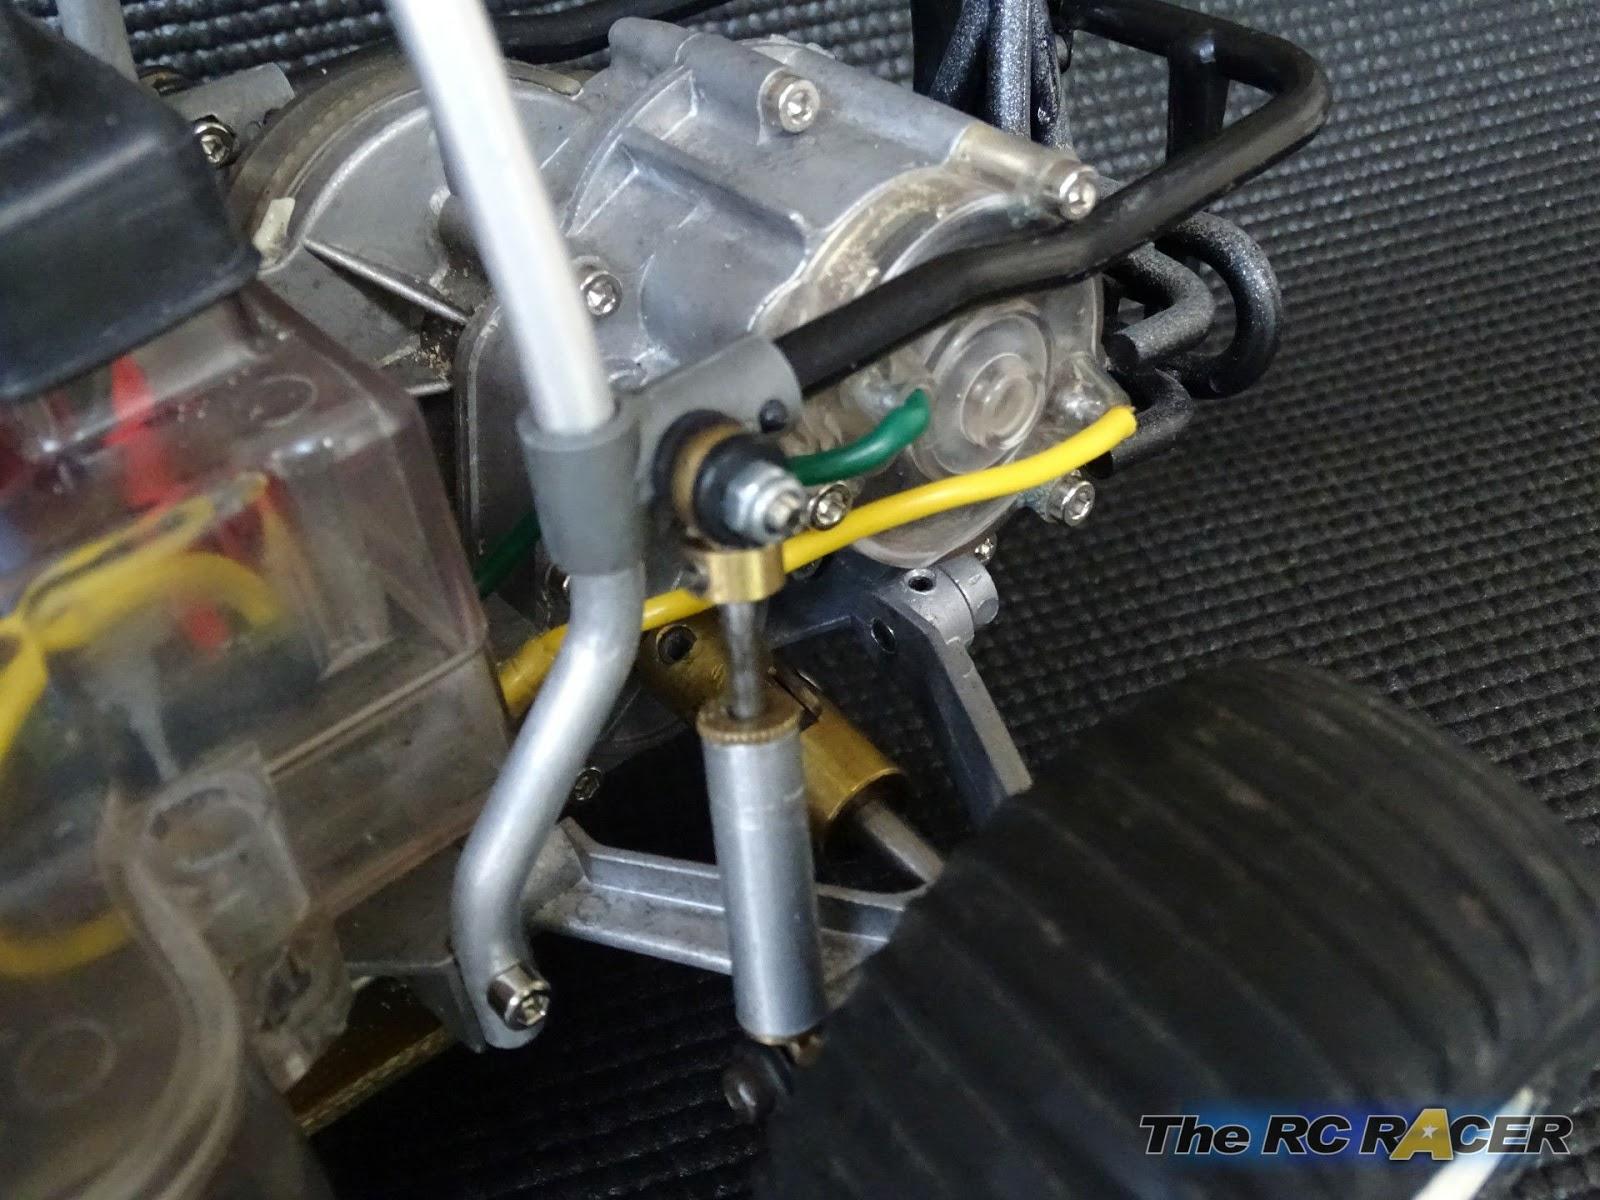 Tamiya SRB Sand Scorcher VW Baja Bug review | The RC Racer